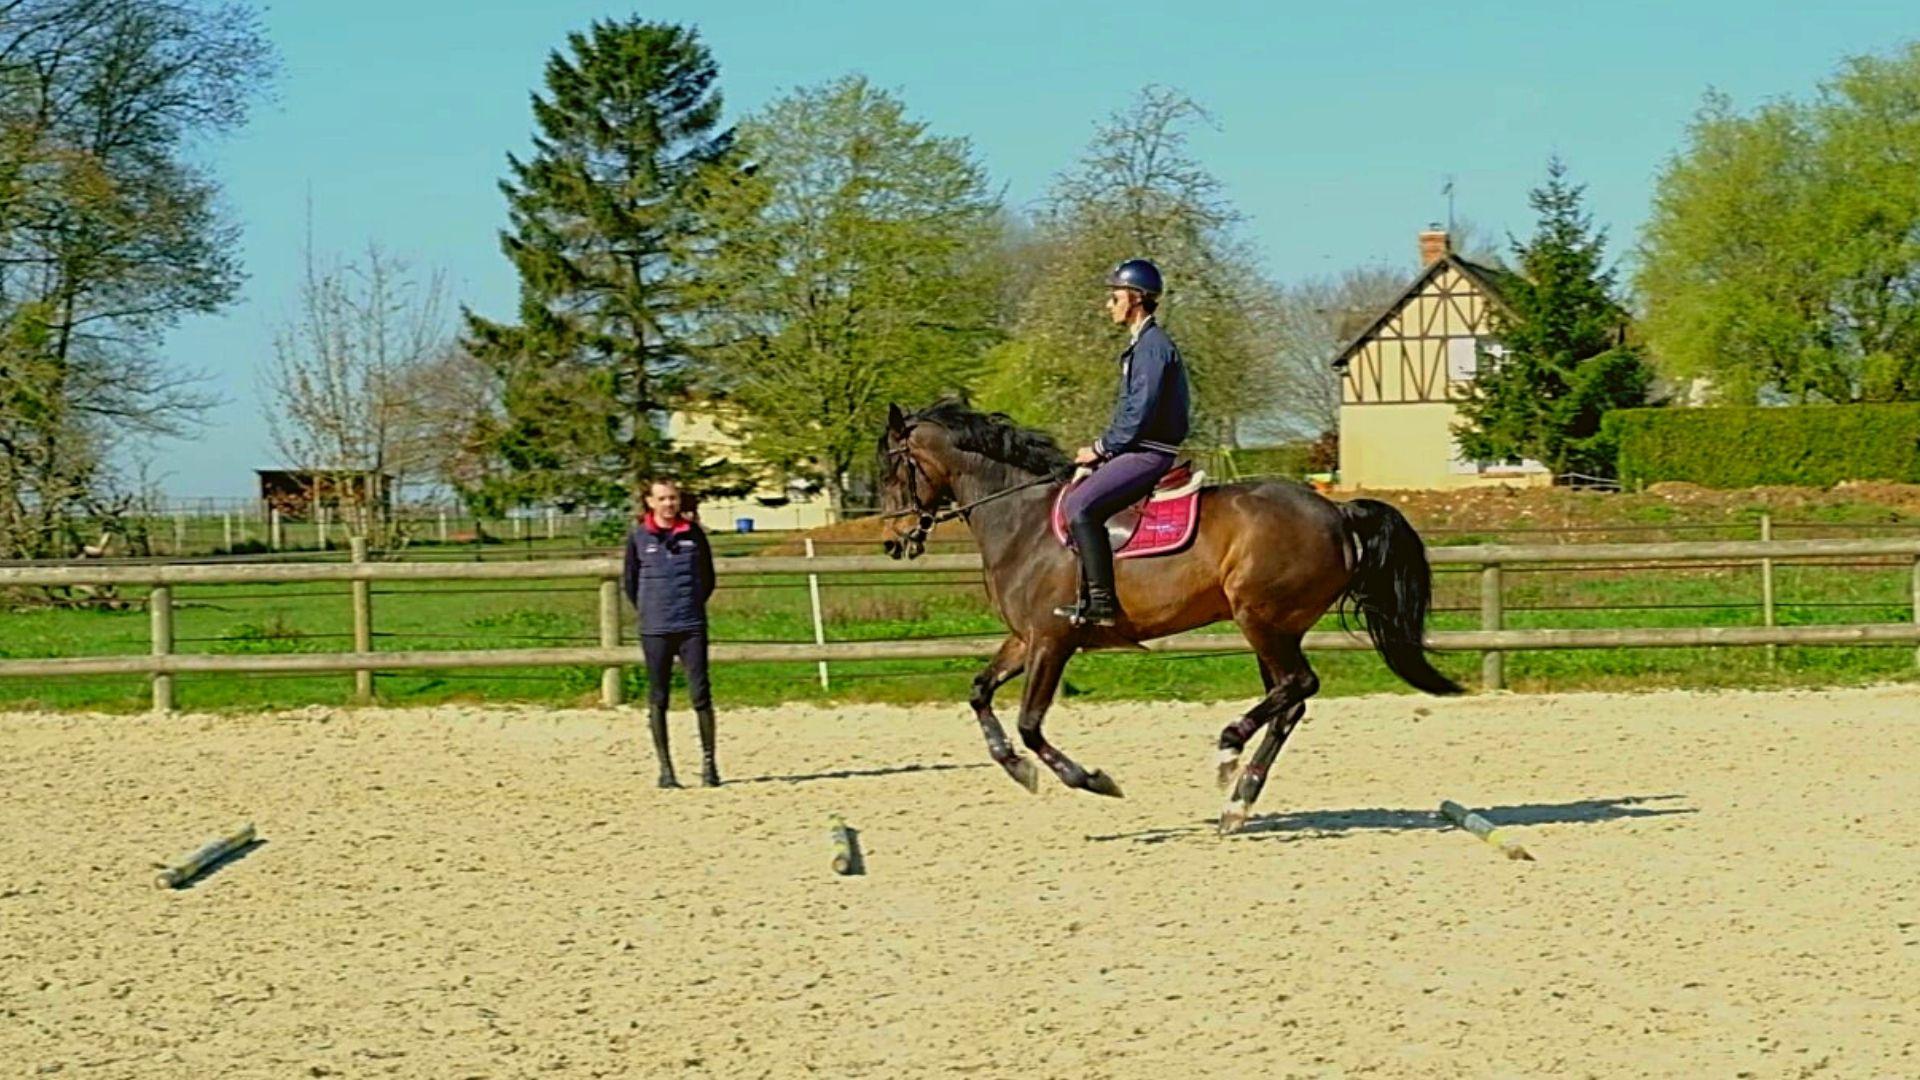 cheval equitation cavalier